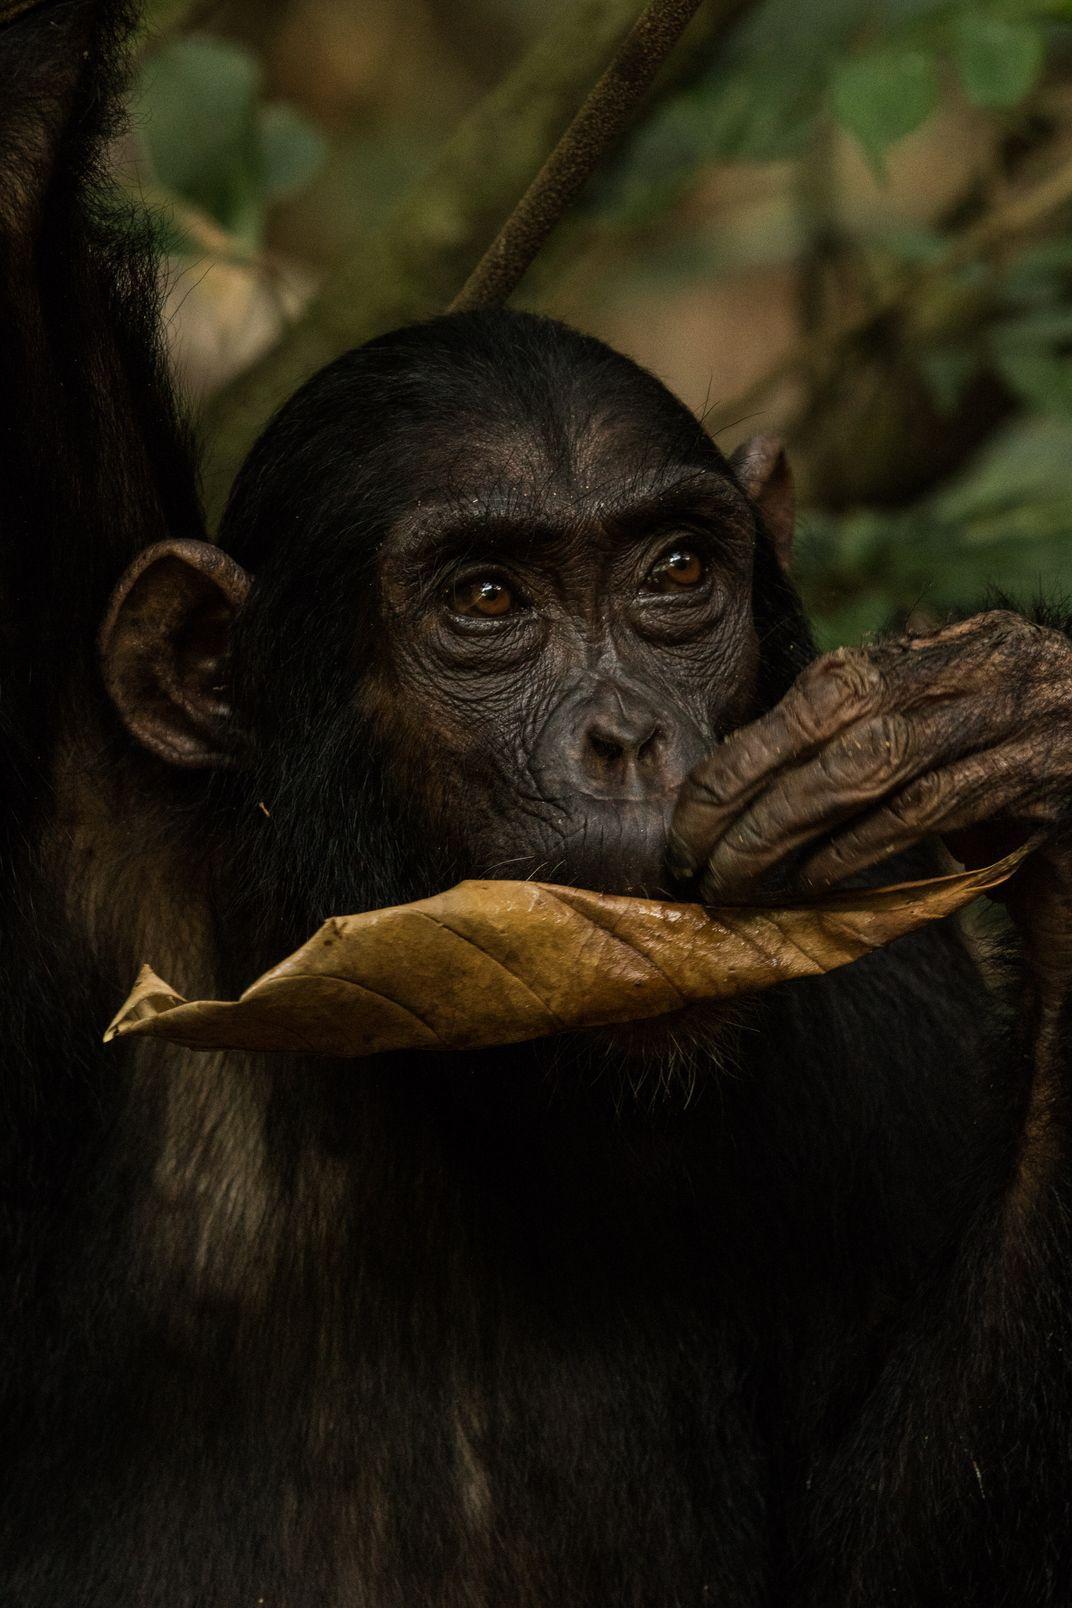 Grooming Chimps | Will Burrard-Lucas